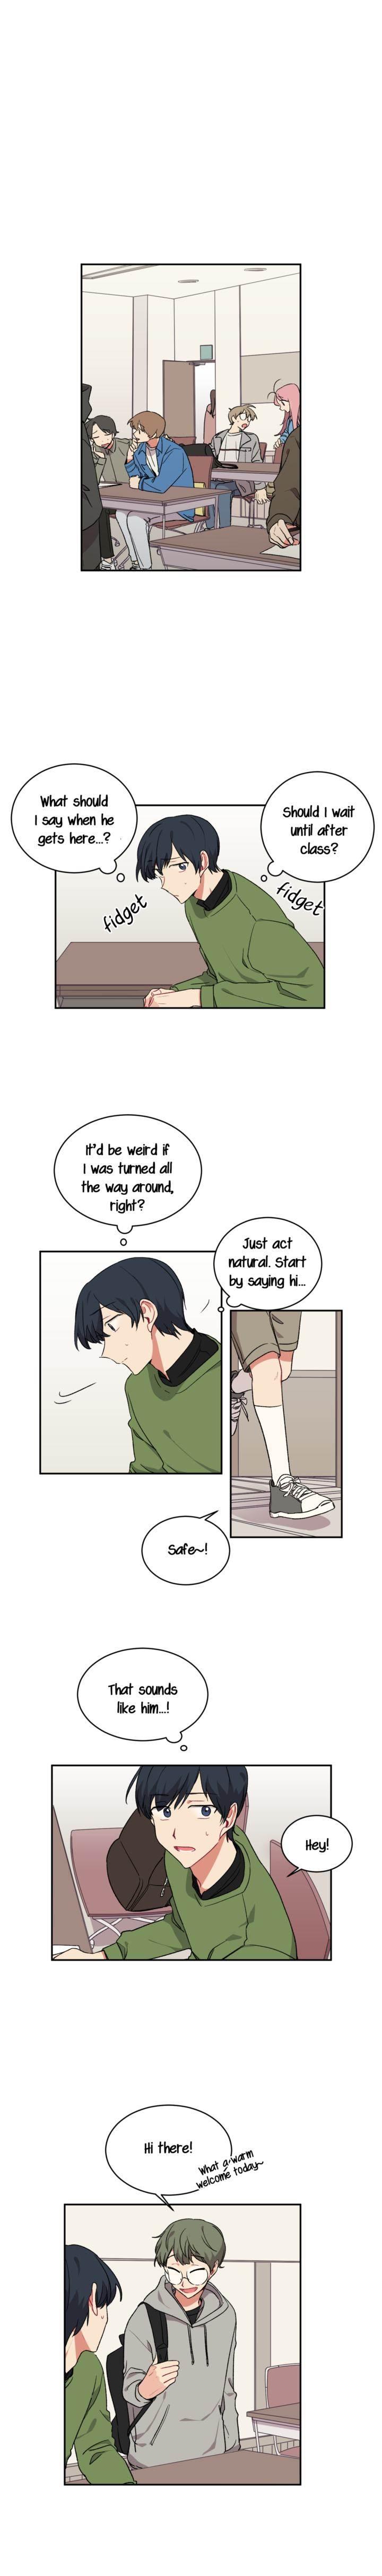 https://manga.mangadogs.com/comics/pic2/45/35437/1155795/021ff8a9becc2eff3b3ec40a10b397e6.jpg Page 1